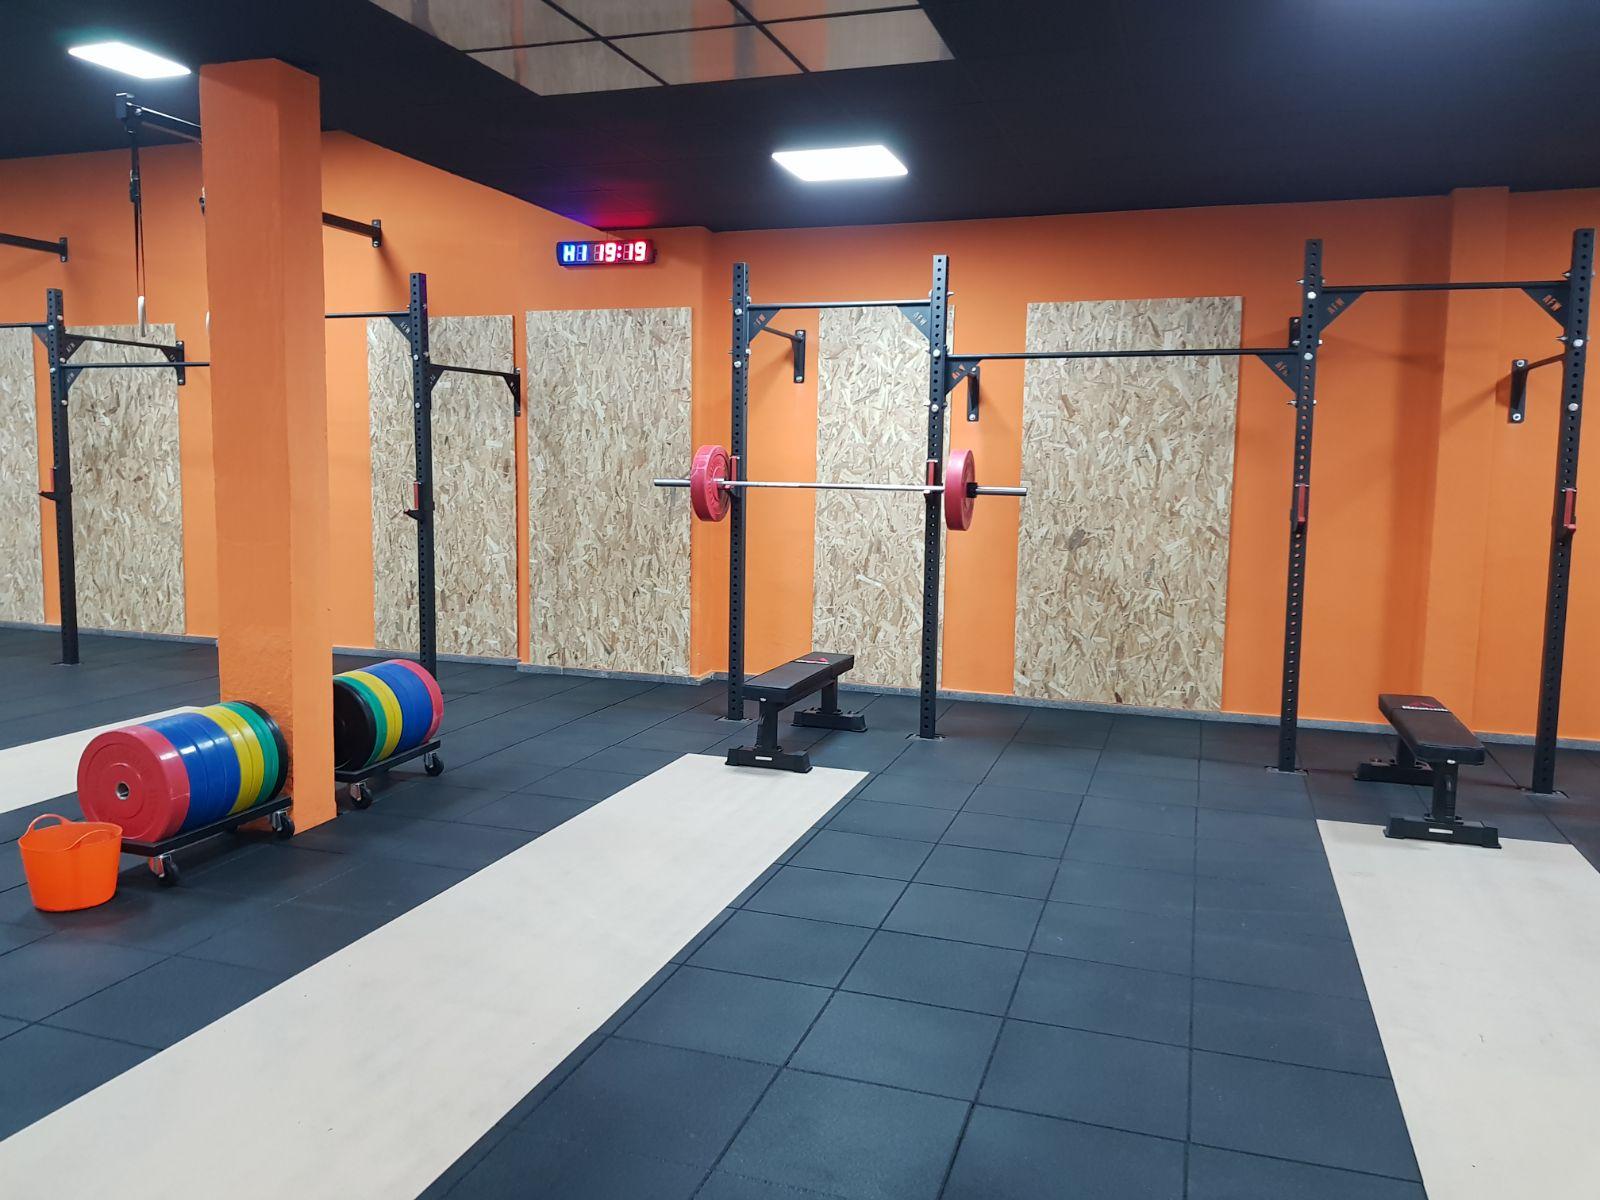 Apertura de un nuevo BOX en Cartagena - Oss Fitness